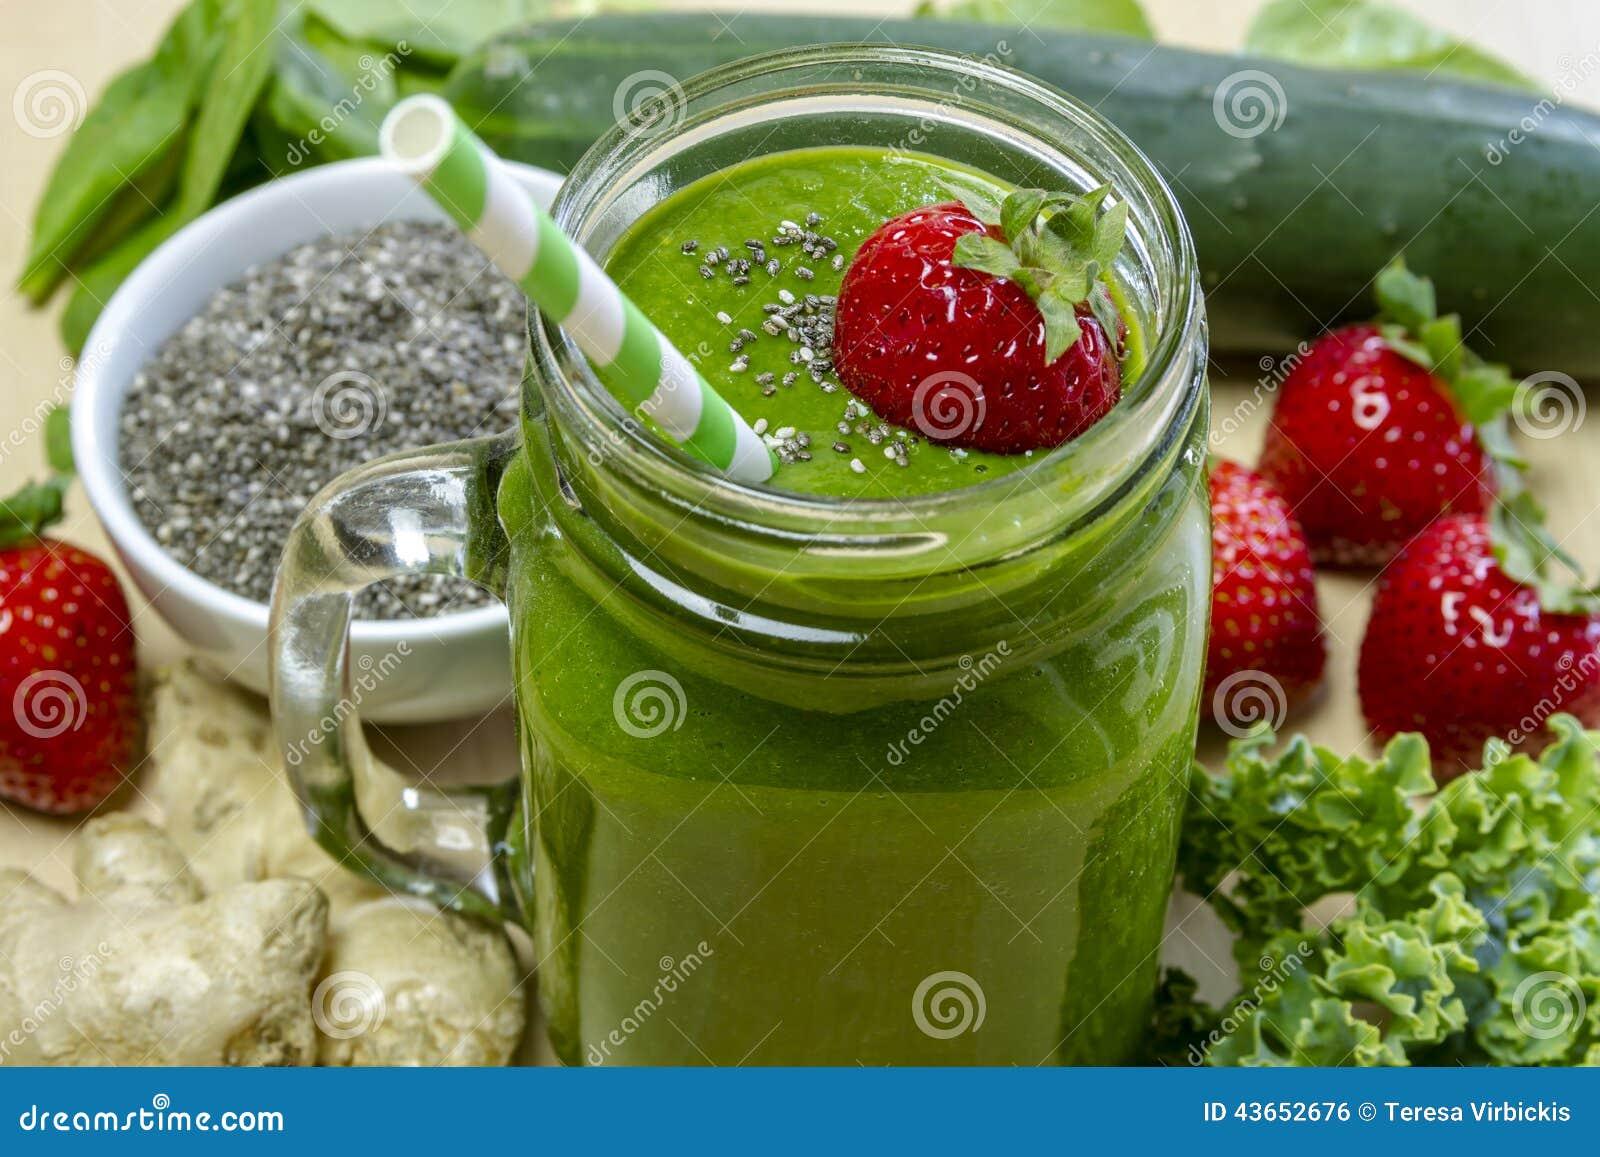 Whole Foods Detox Drink